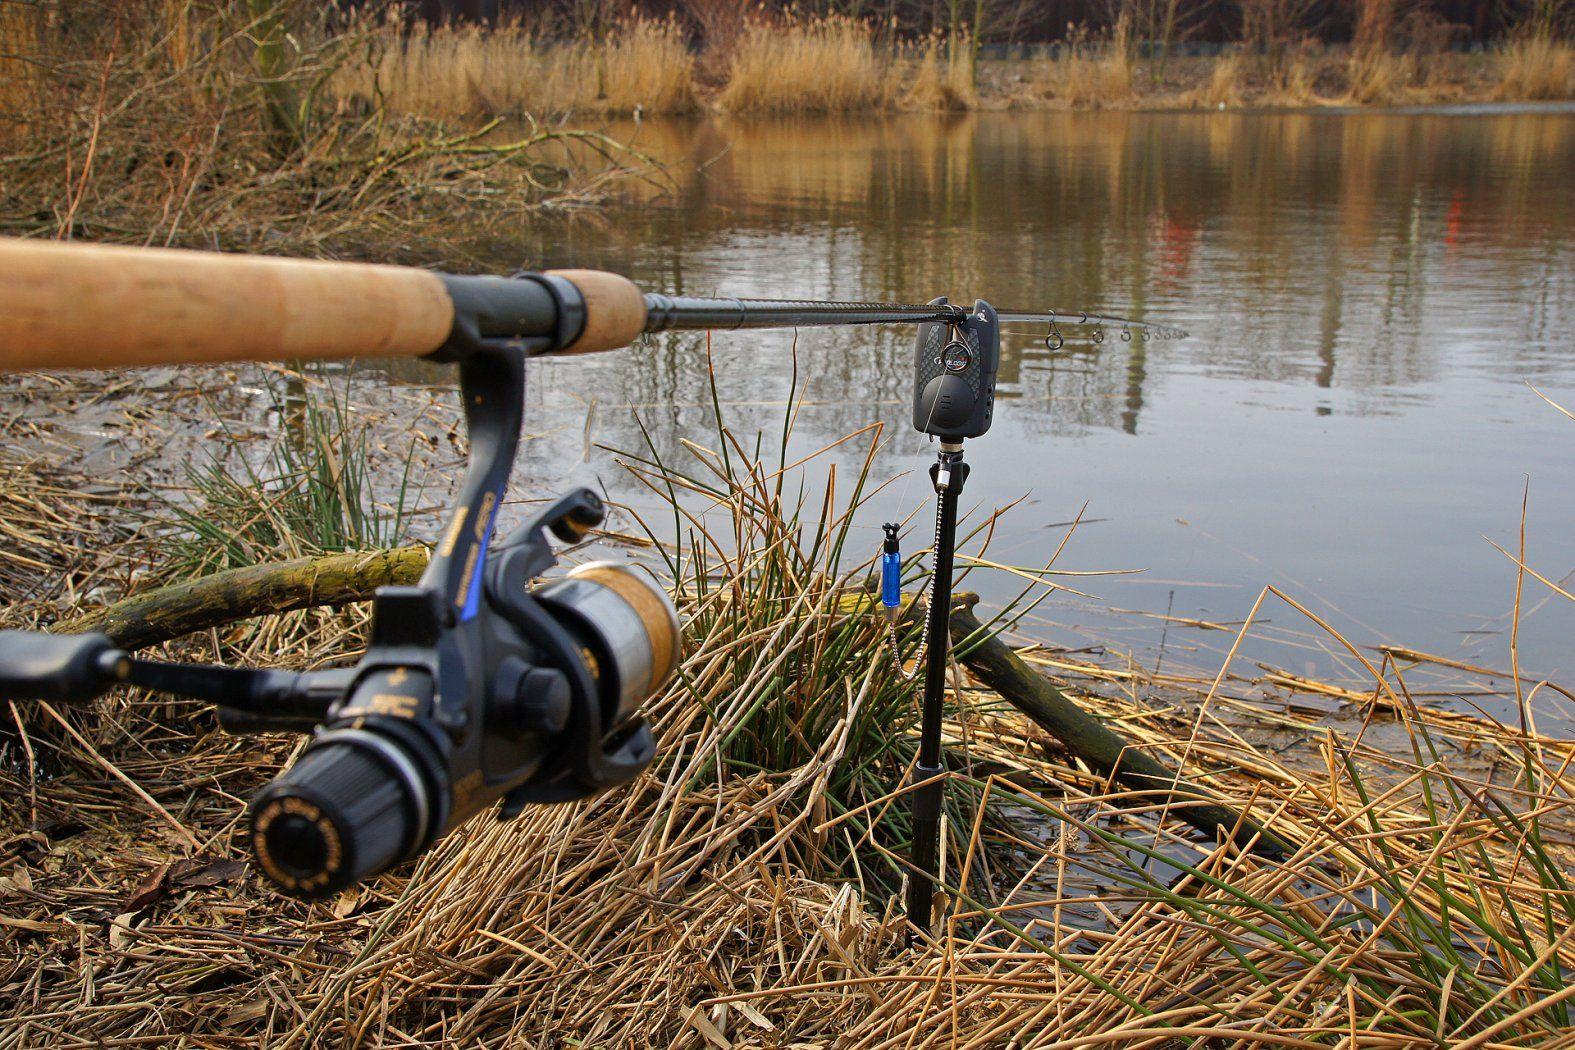 Eine haarige Sache | Angeln, Aal angeln, Aal